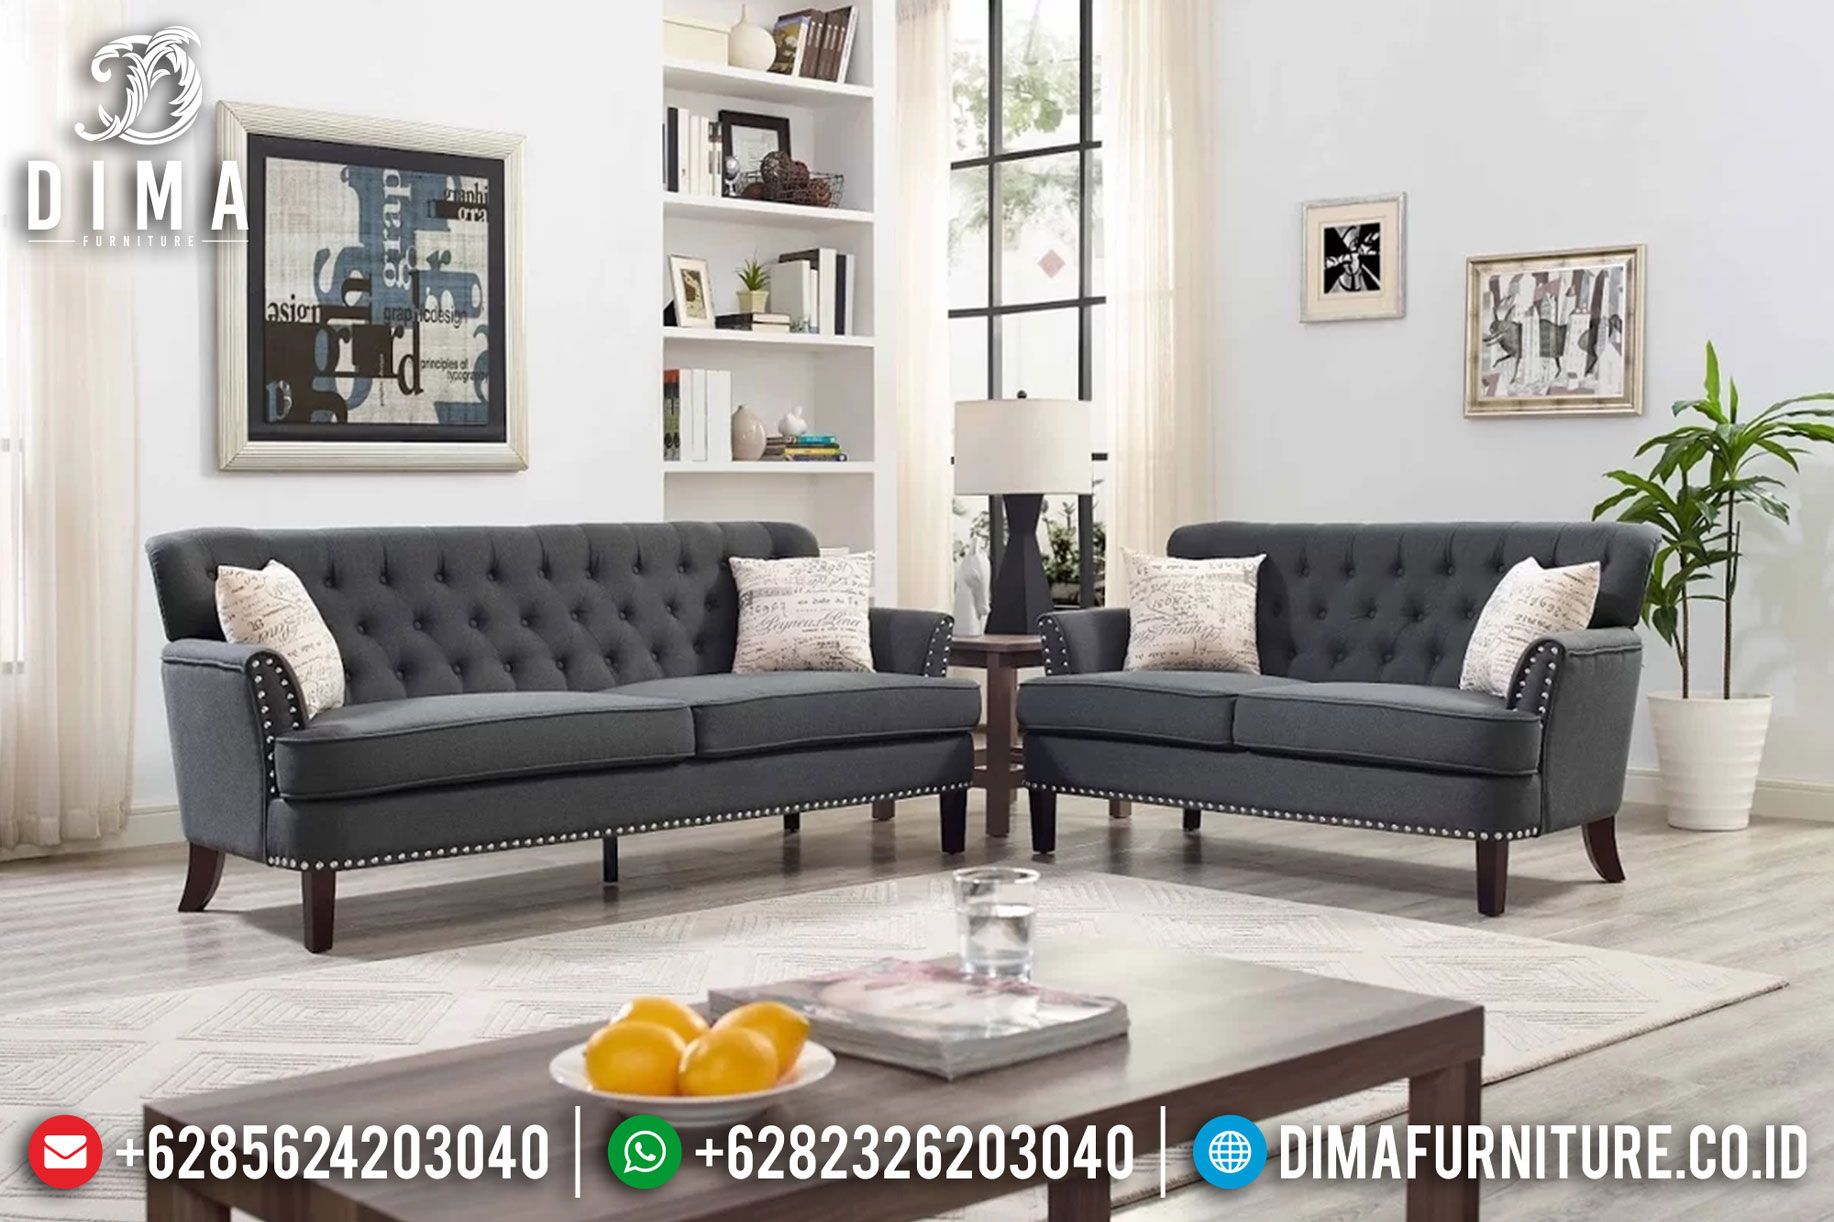 Terbaru Model Kursi Sofa Tamu Minimalis Jepara Fabric Skin MMJ-0032